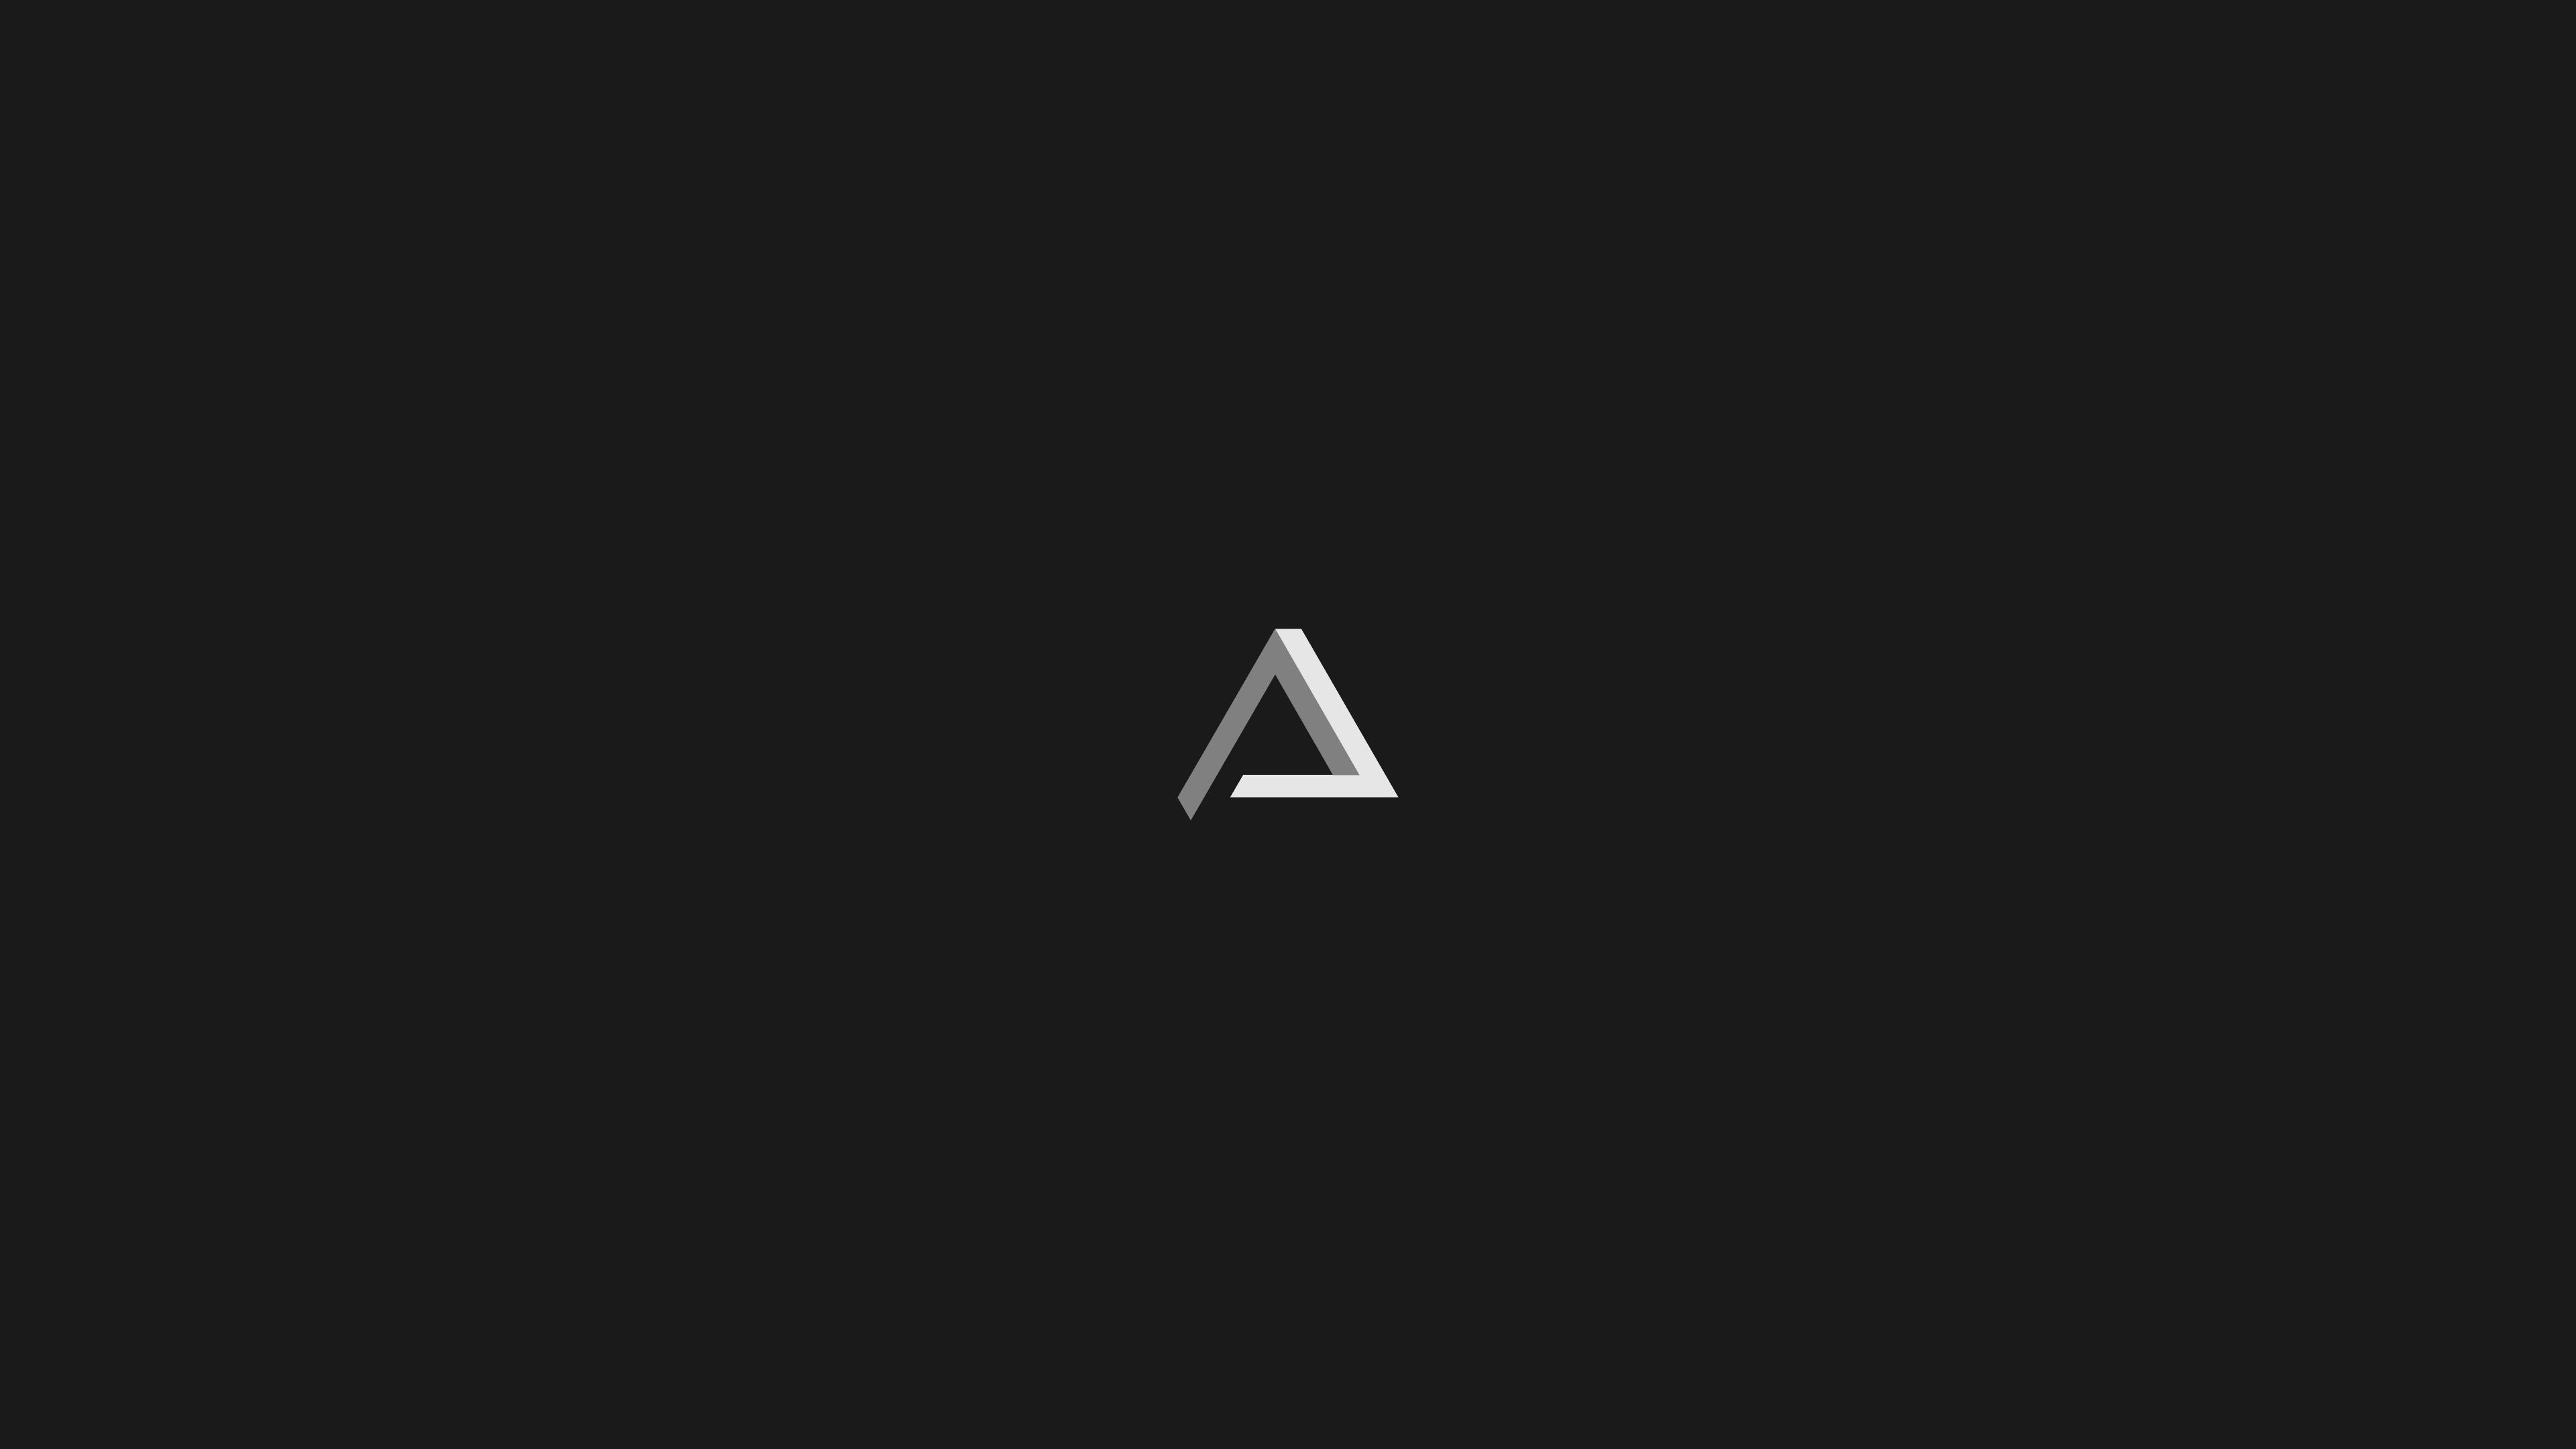 General 3840x2160 geometry minimalism Penrose triangle digital art artwork monochrome dark